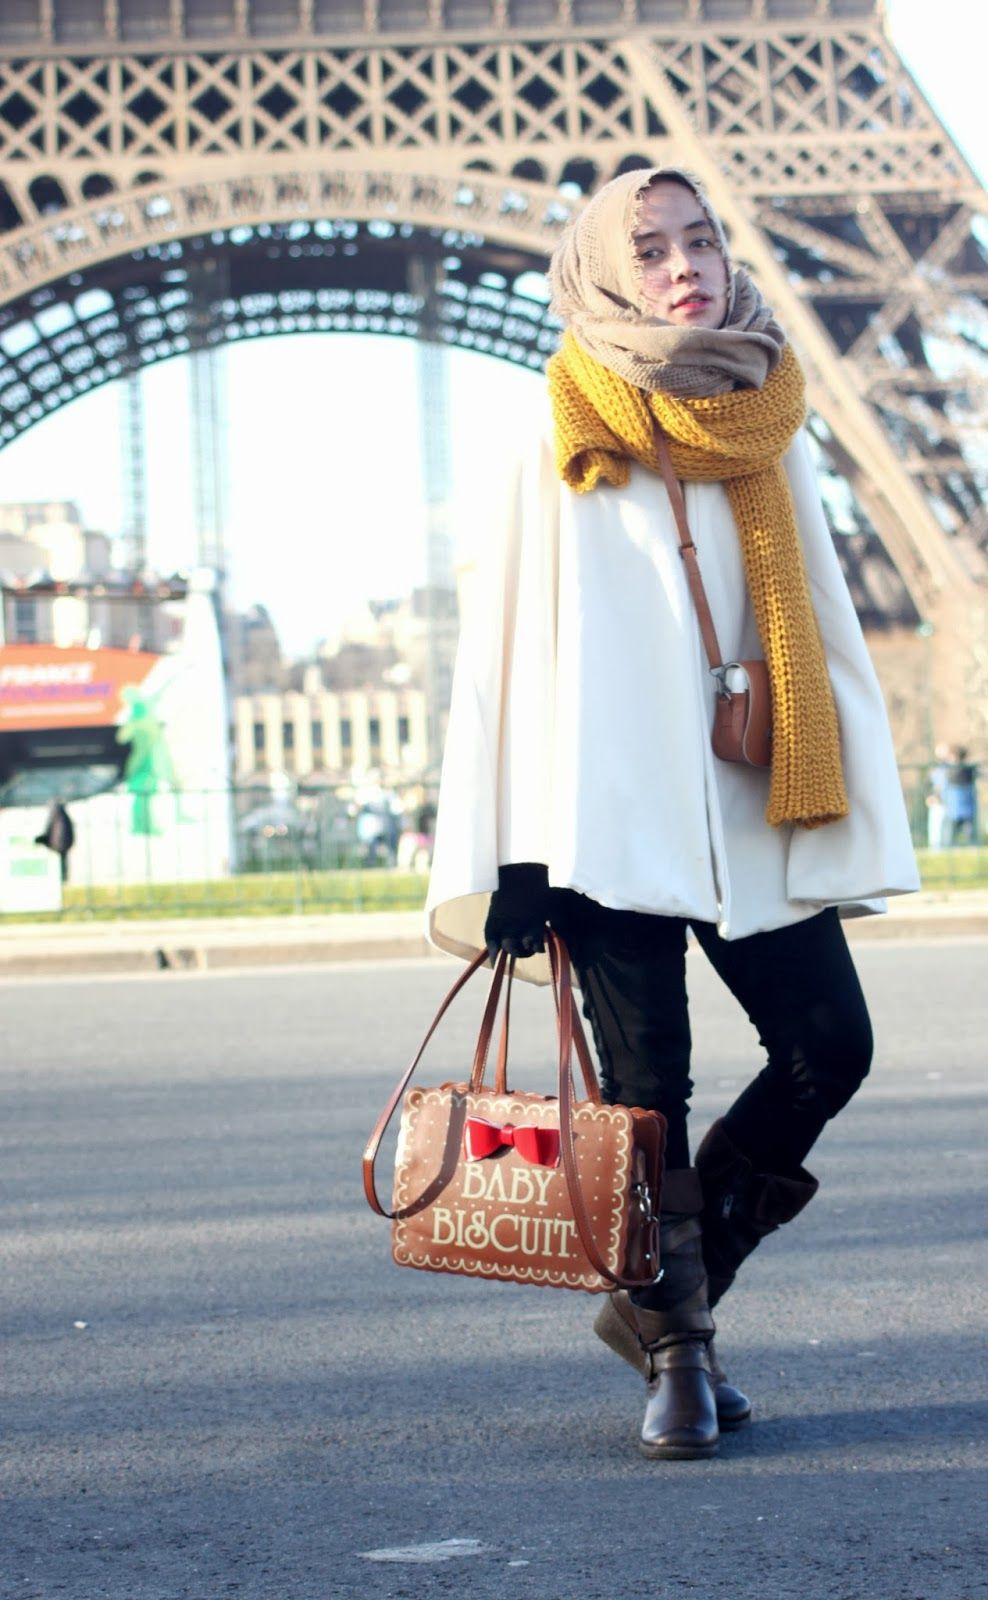 Mustard Skies Qonitah Al Jundiah Hijab Modesty Pinterest